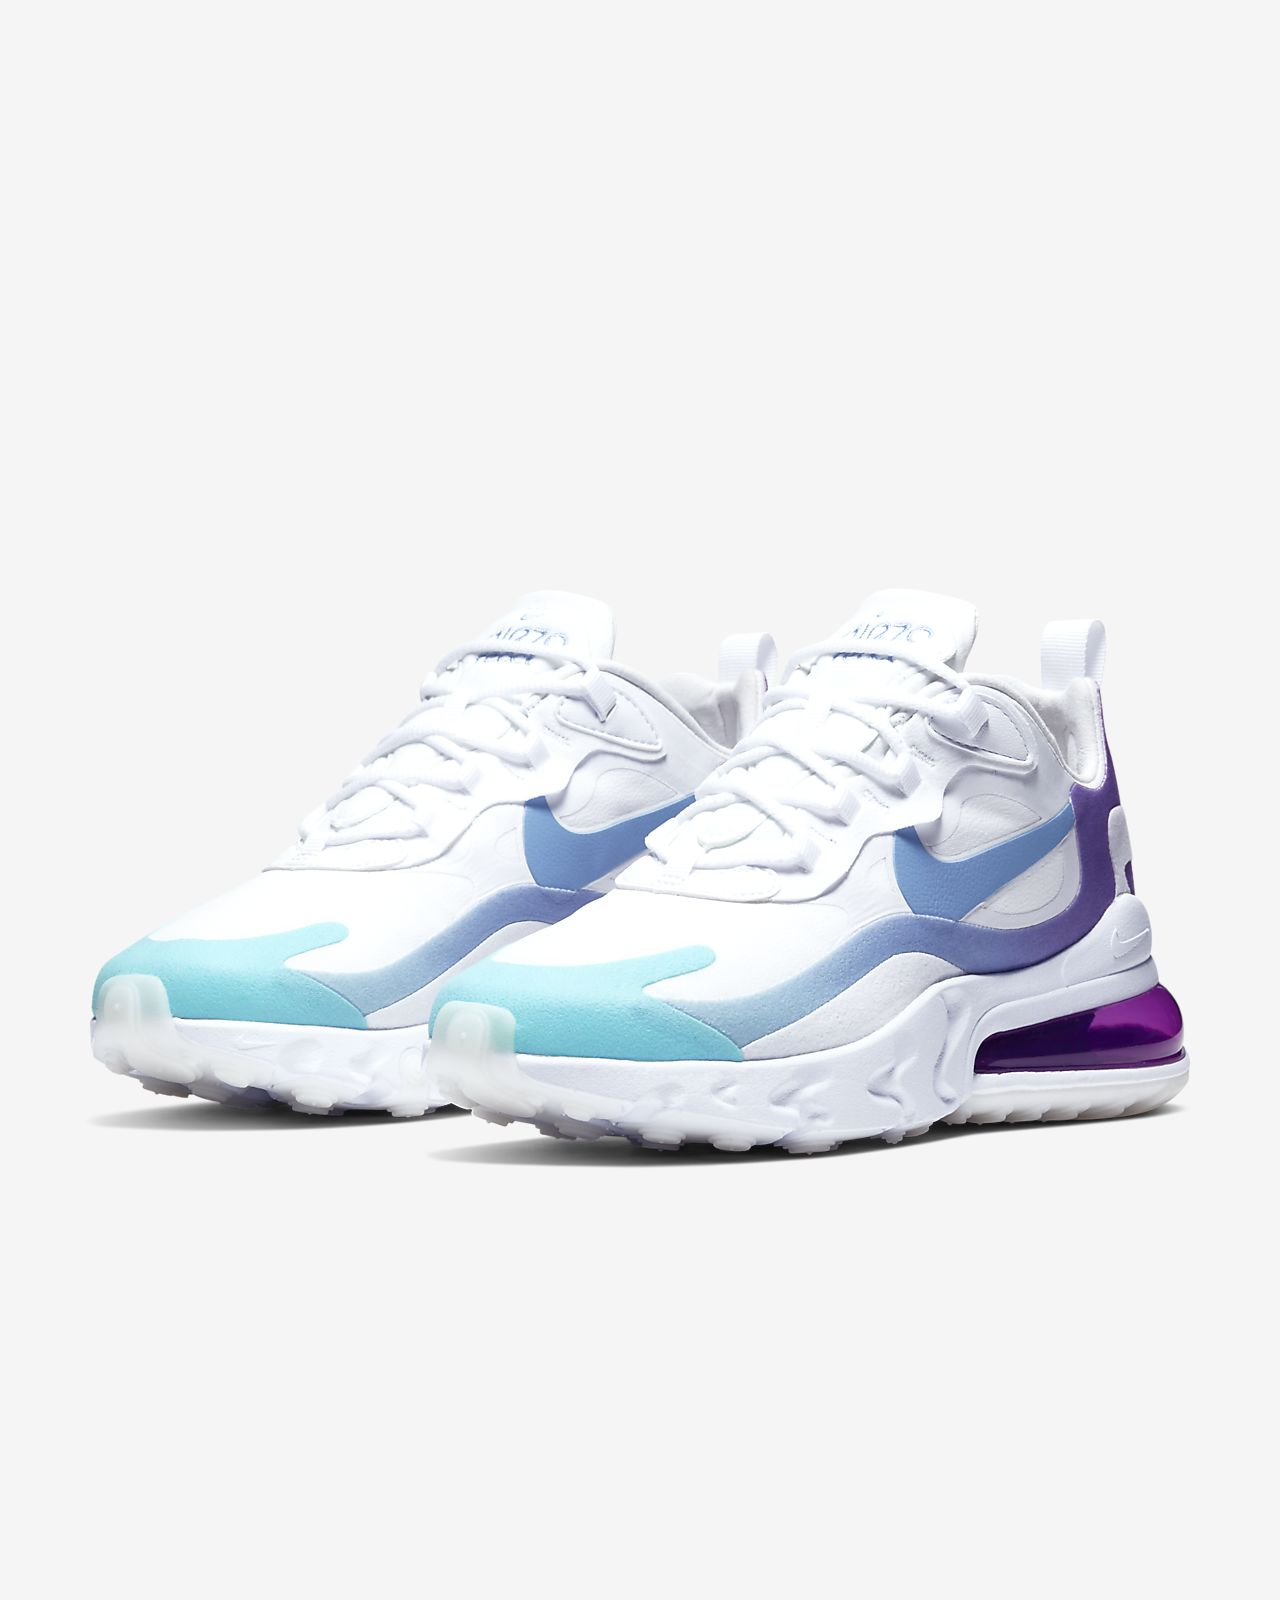 Nike Air Max 270 W shoes blue purple   WeAre Shop